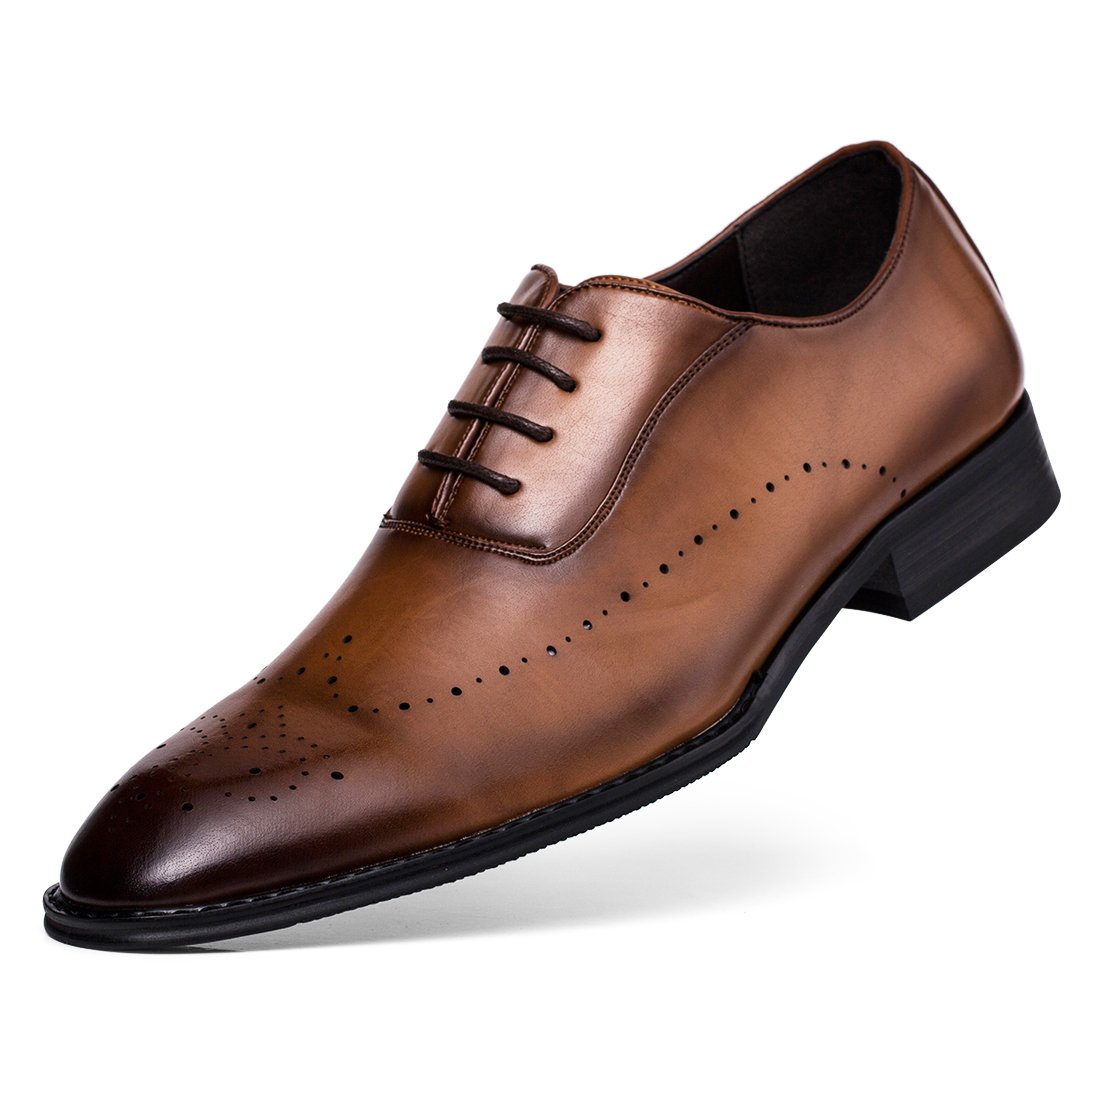 Jivana Oxford Busniess Dress Shoes Men Father Lace-up (11, Brown-7)